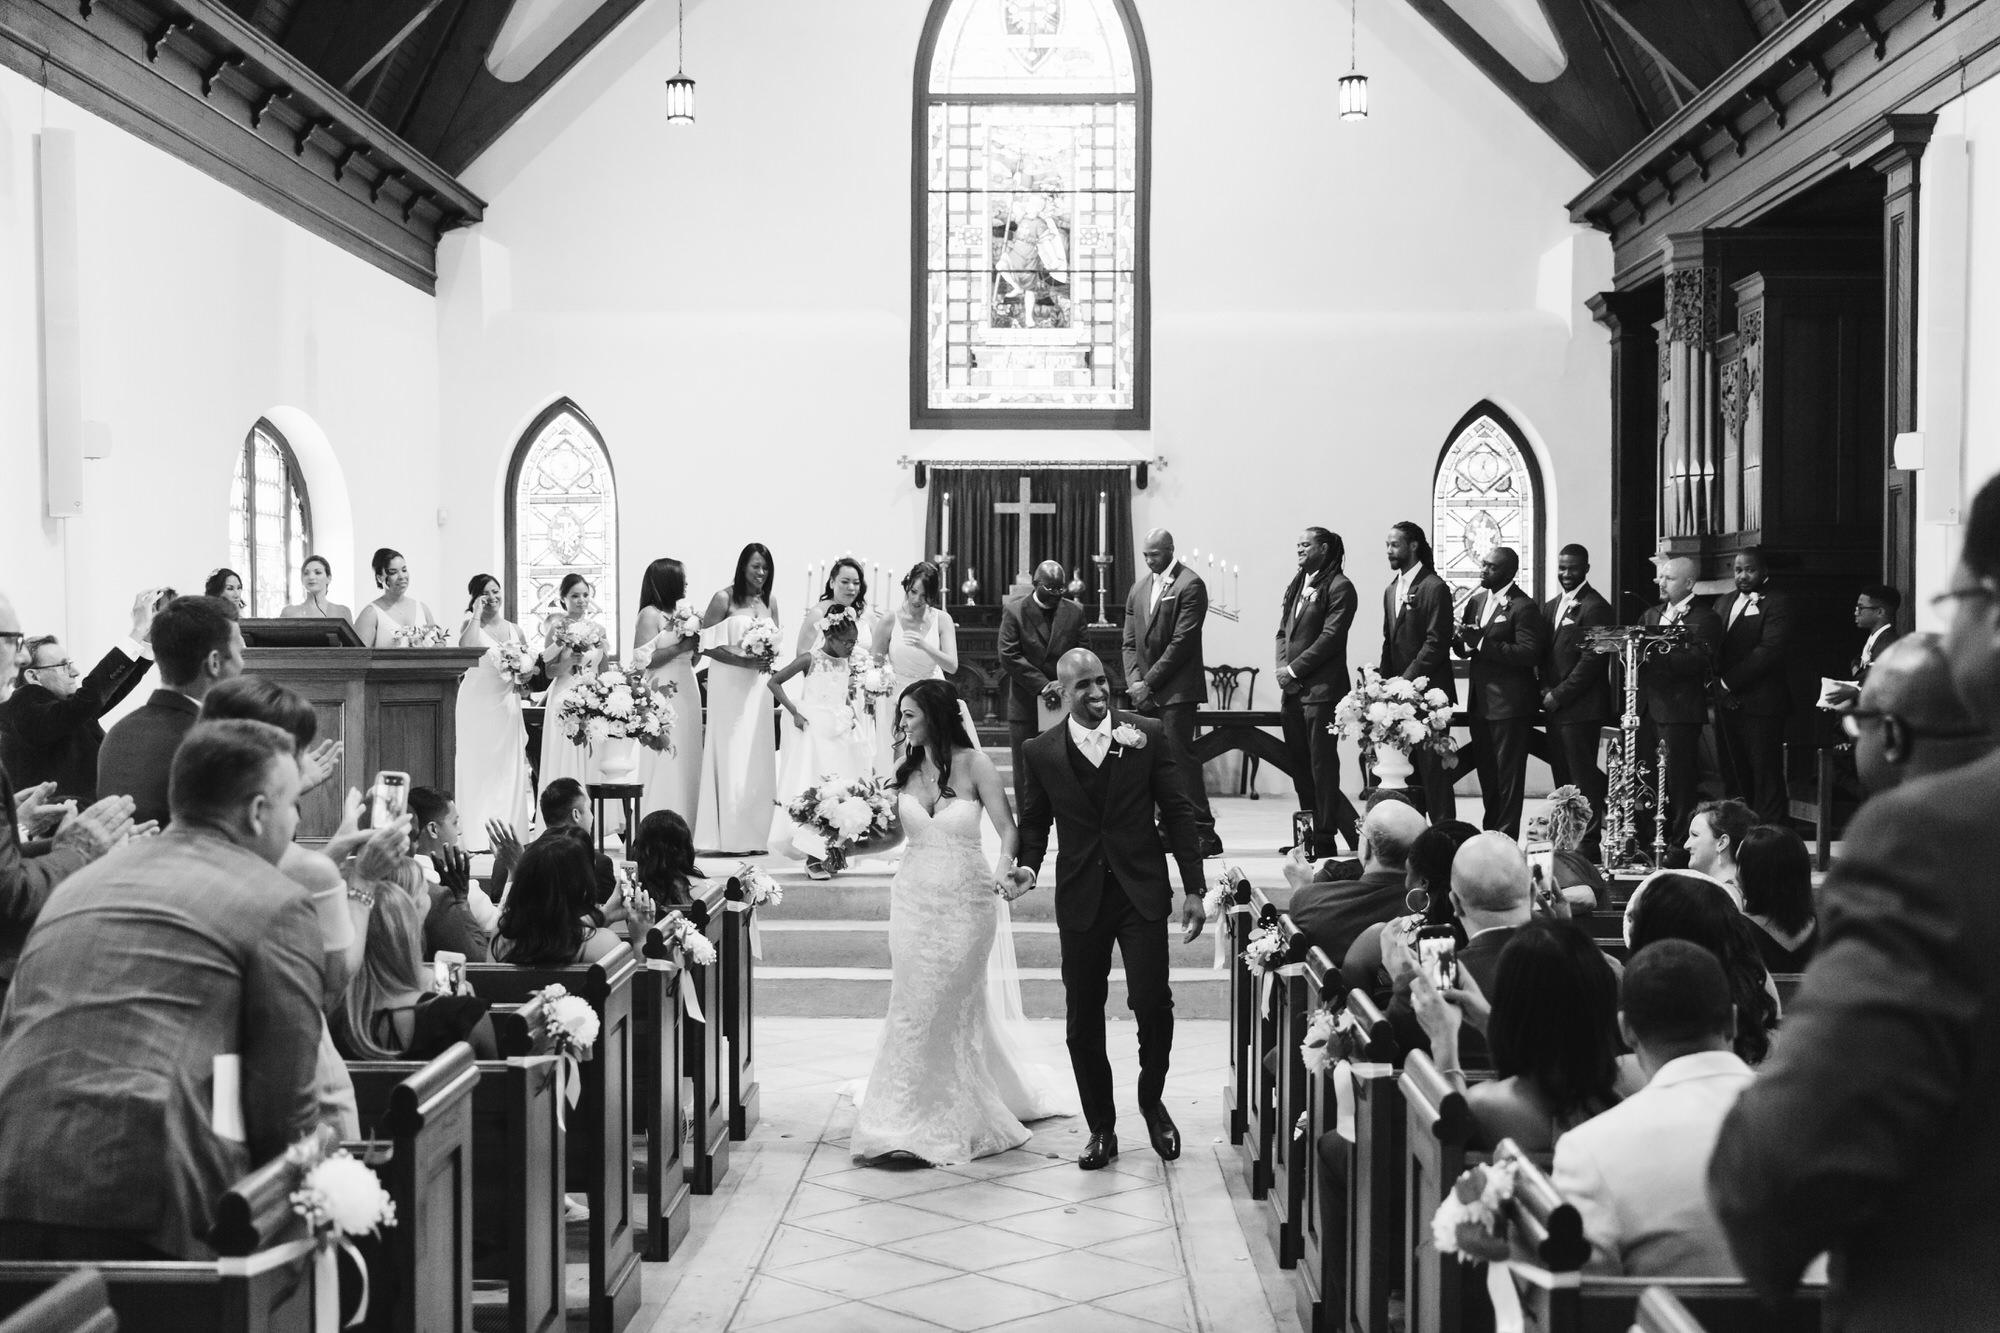 st-lukes-chapel-cannon-green-charleston-wedding-934.JPG